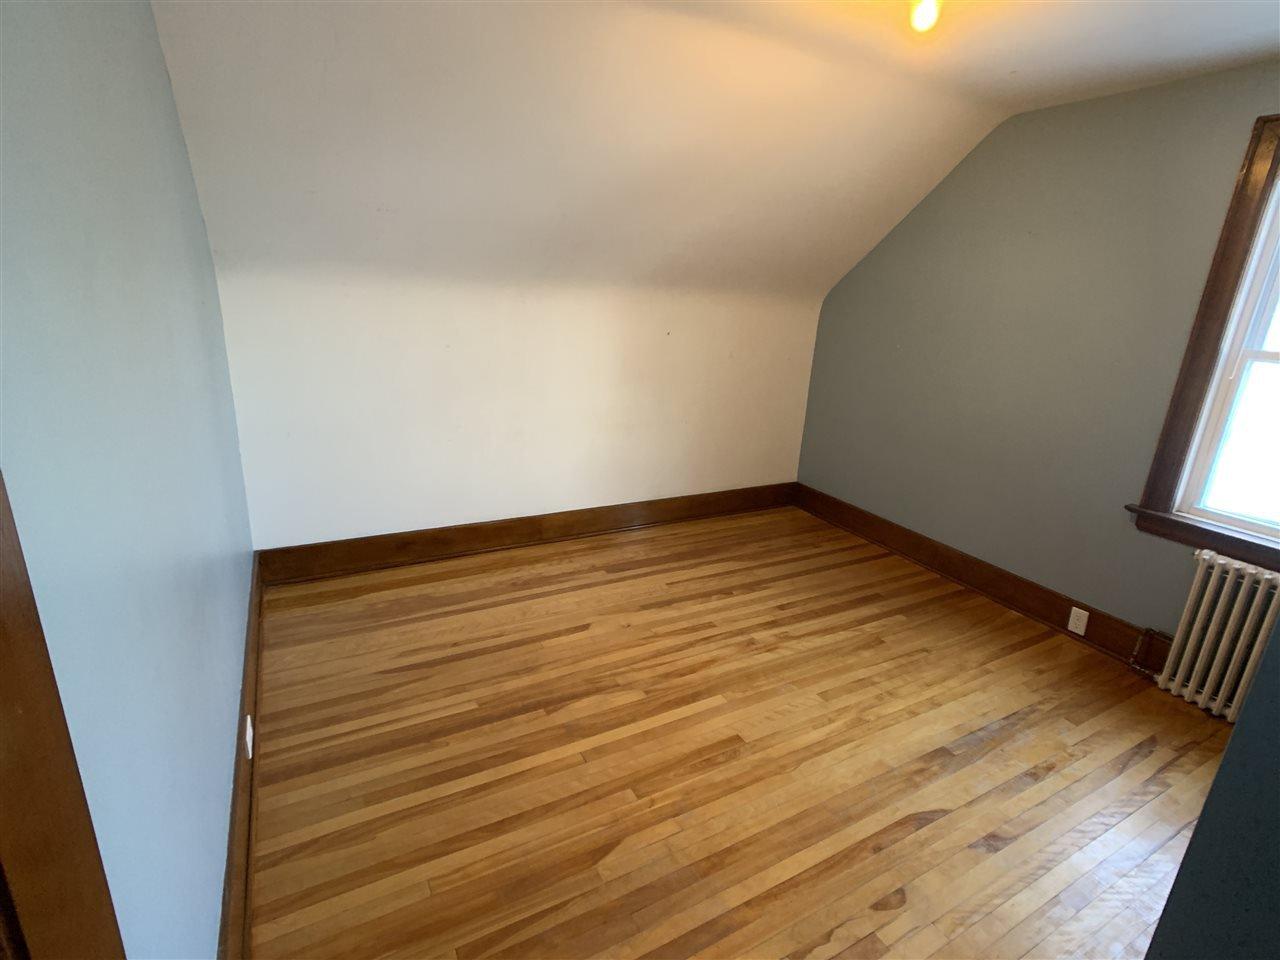 Photo 18: Photos: 30 Bell Street in New Glasgow: 106-New Glasgow, Stellarton Residential for sale (Northern Region)  : MLS®# 202002376